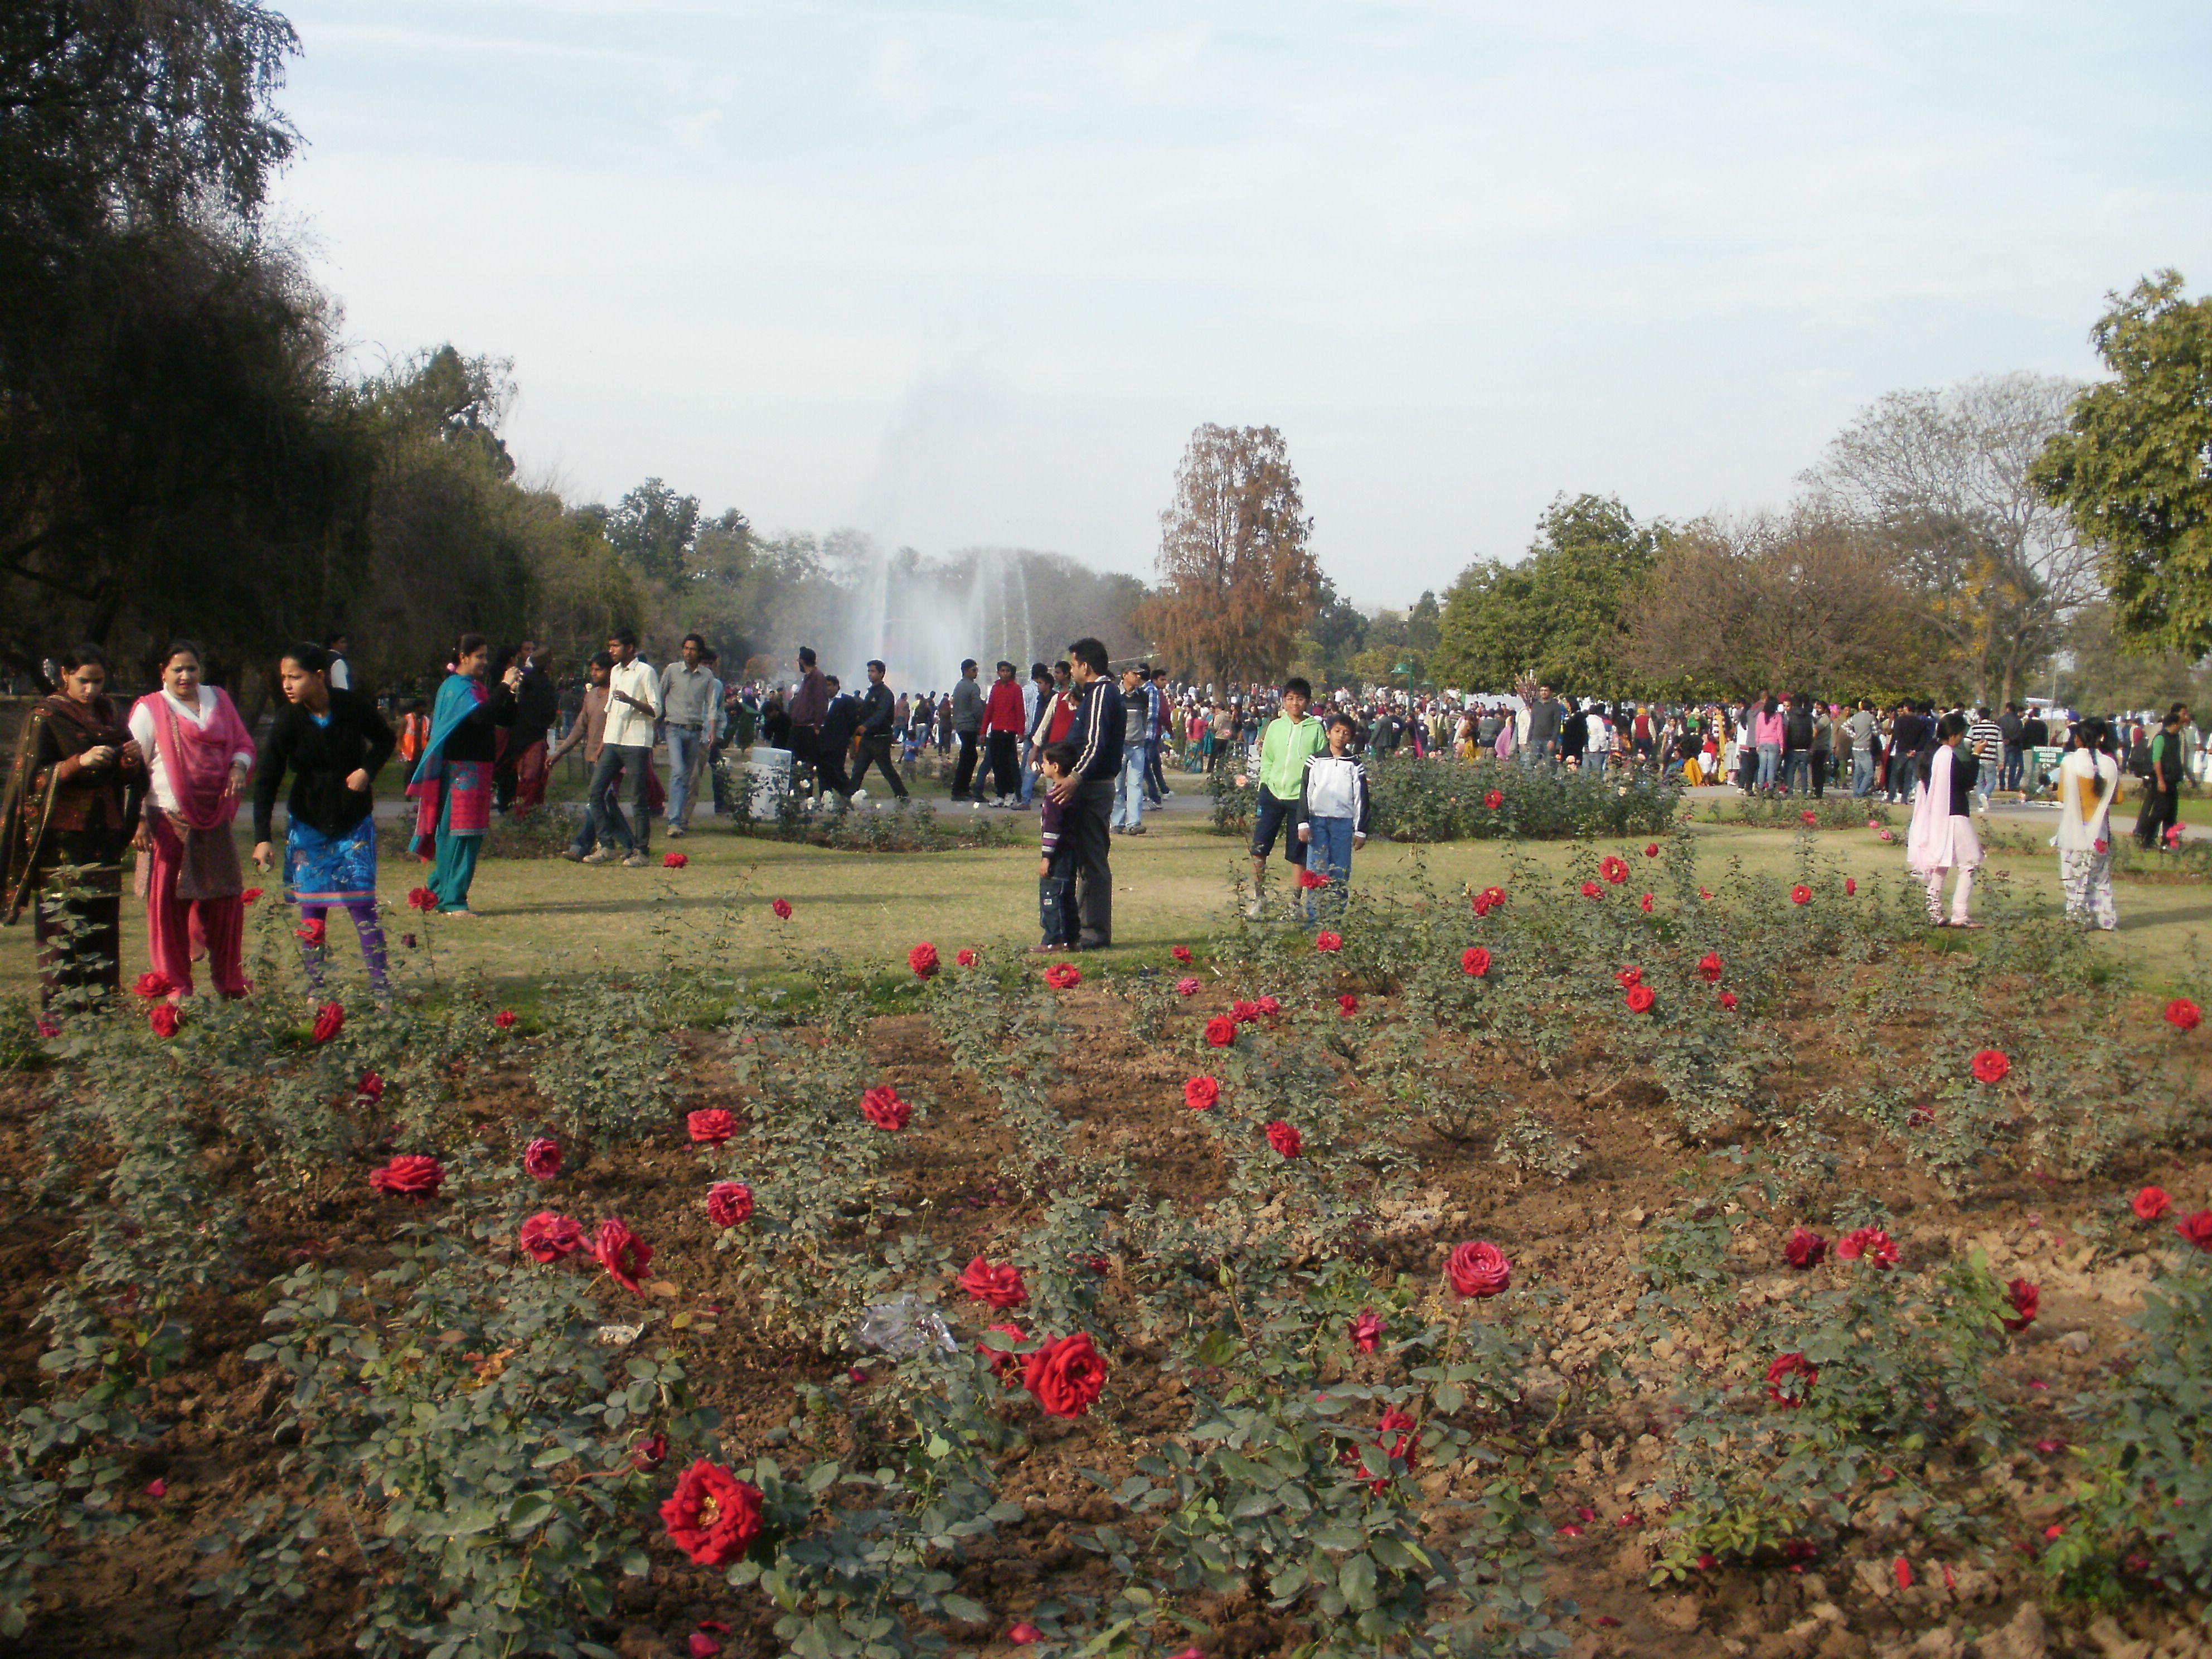 Rose Garden, Chandigarh during the Rose Festival, February each year ...